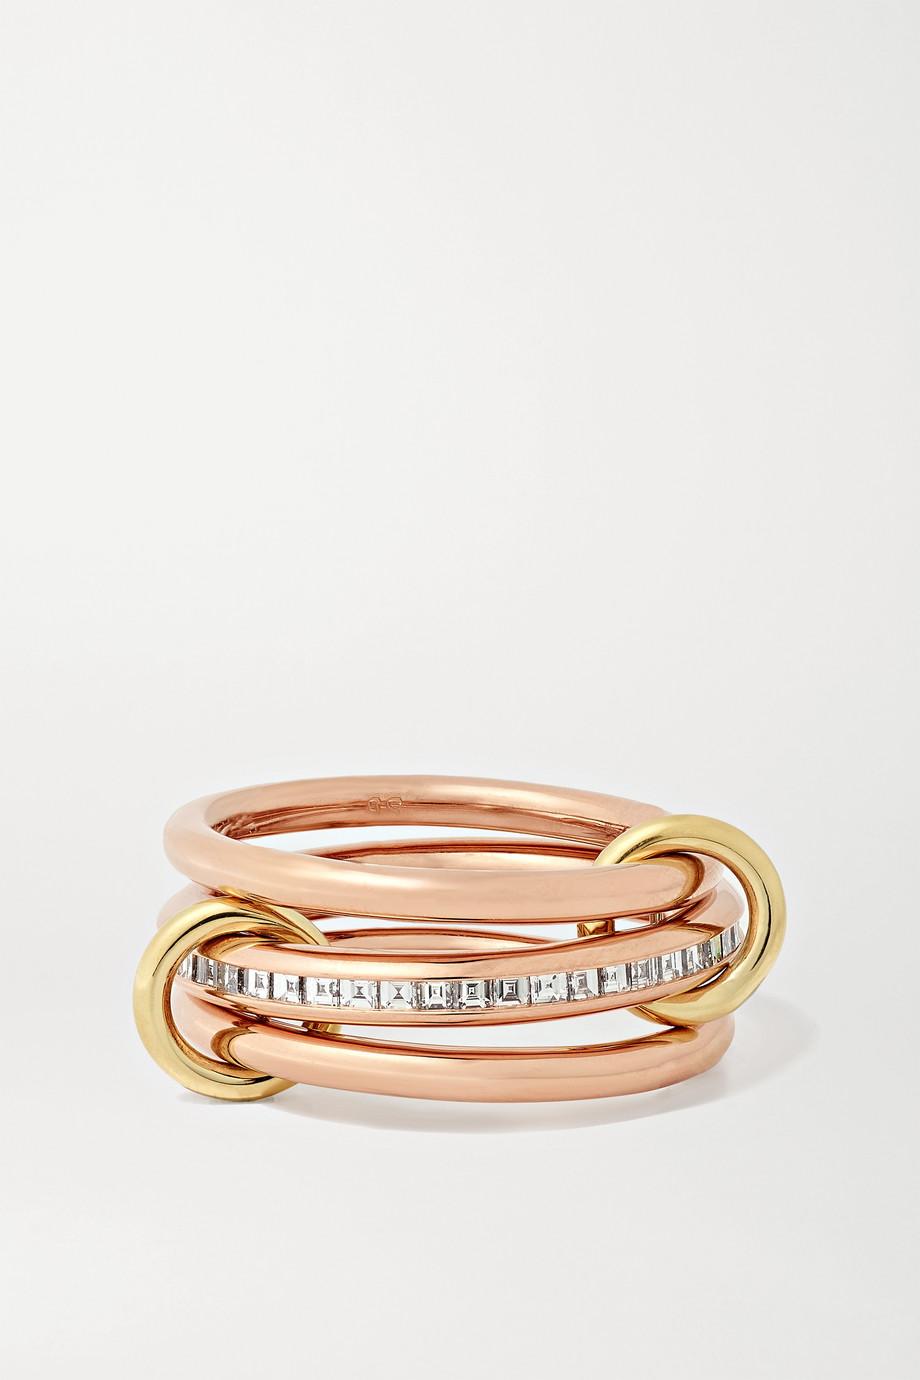 Spinelli Kilcollin Renè set of three 18-karat yellow and rose gold diamond rings